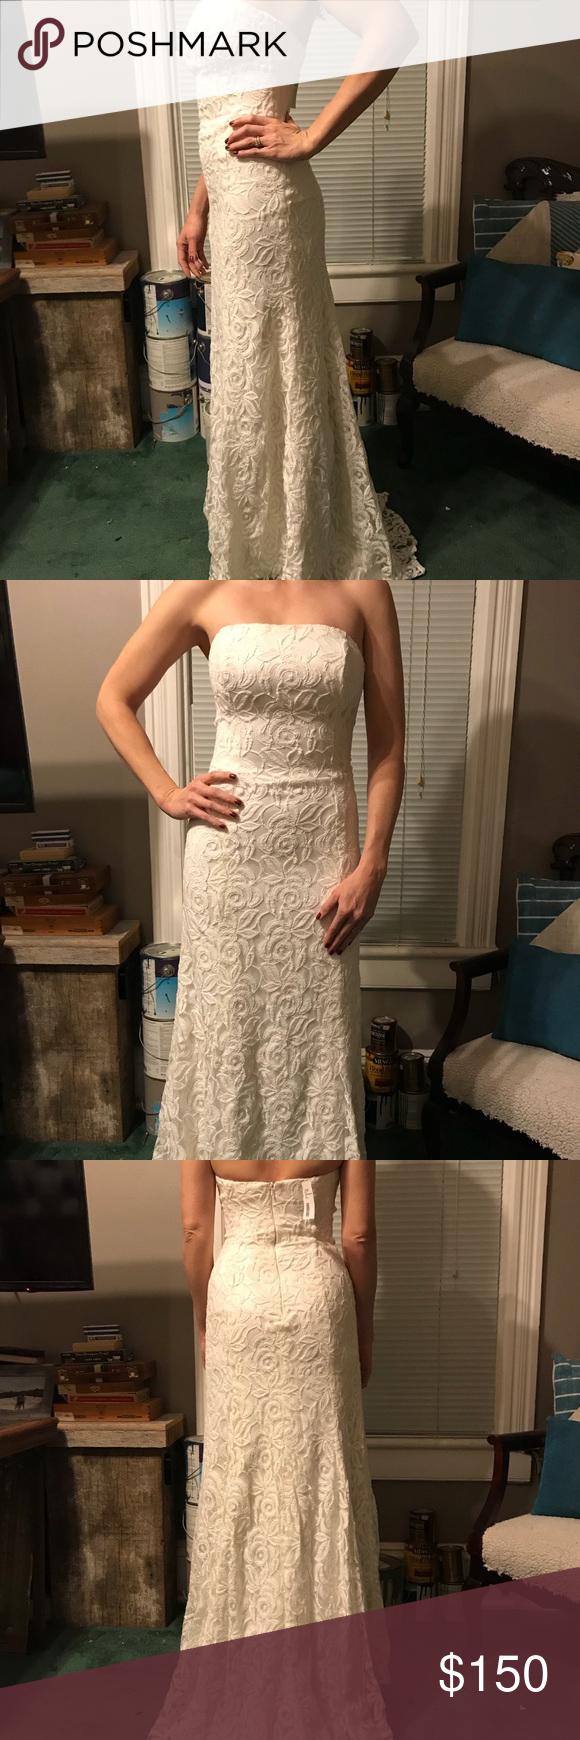 NWT ivory wedding dress sample sale NYC   Wedding dress sample sale ...